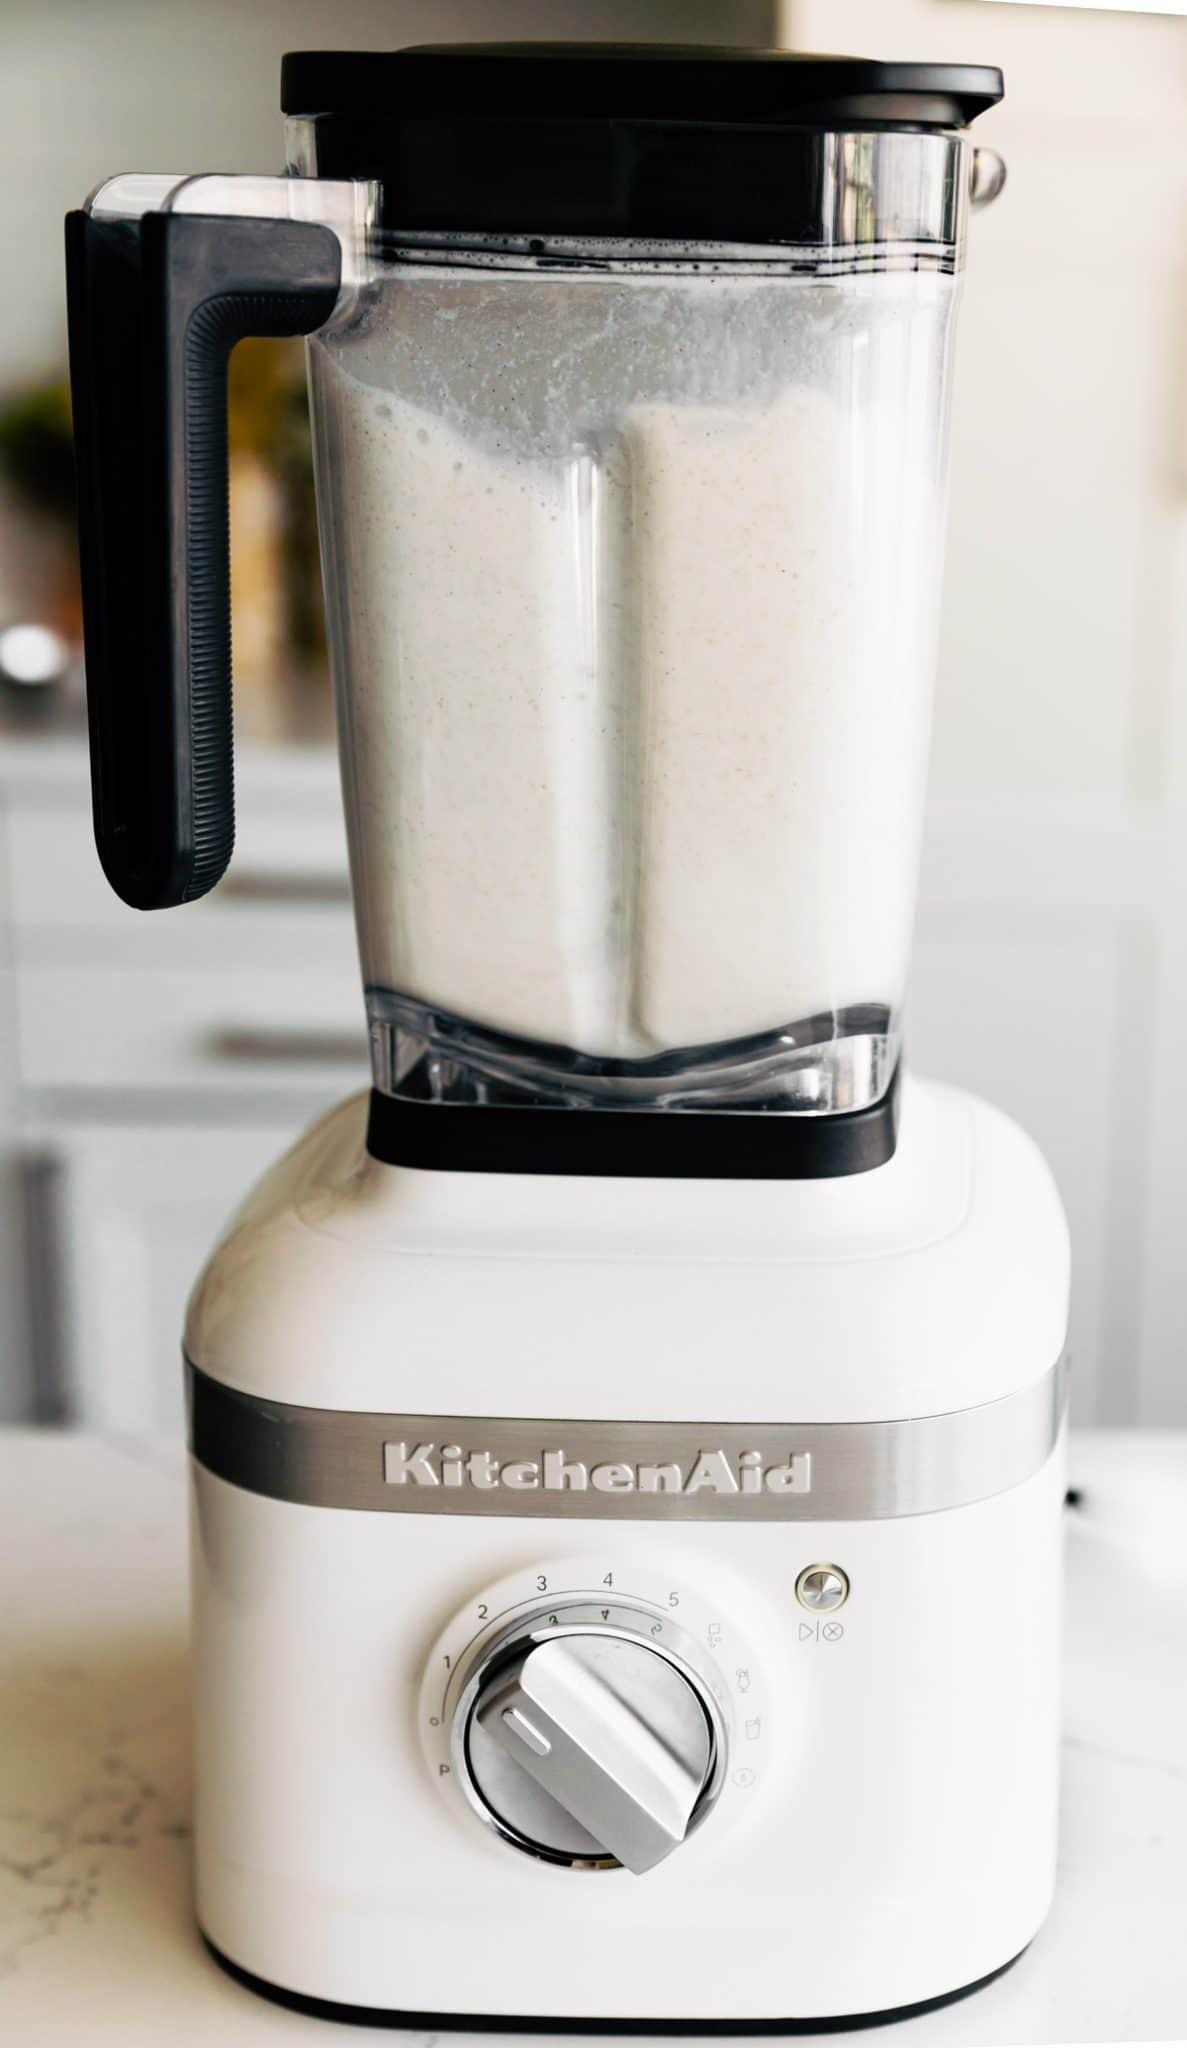 image shows how to make hemp milk in a white KitchenAid blender